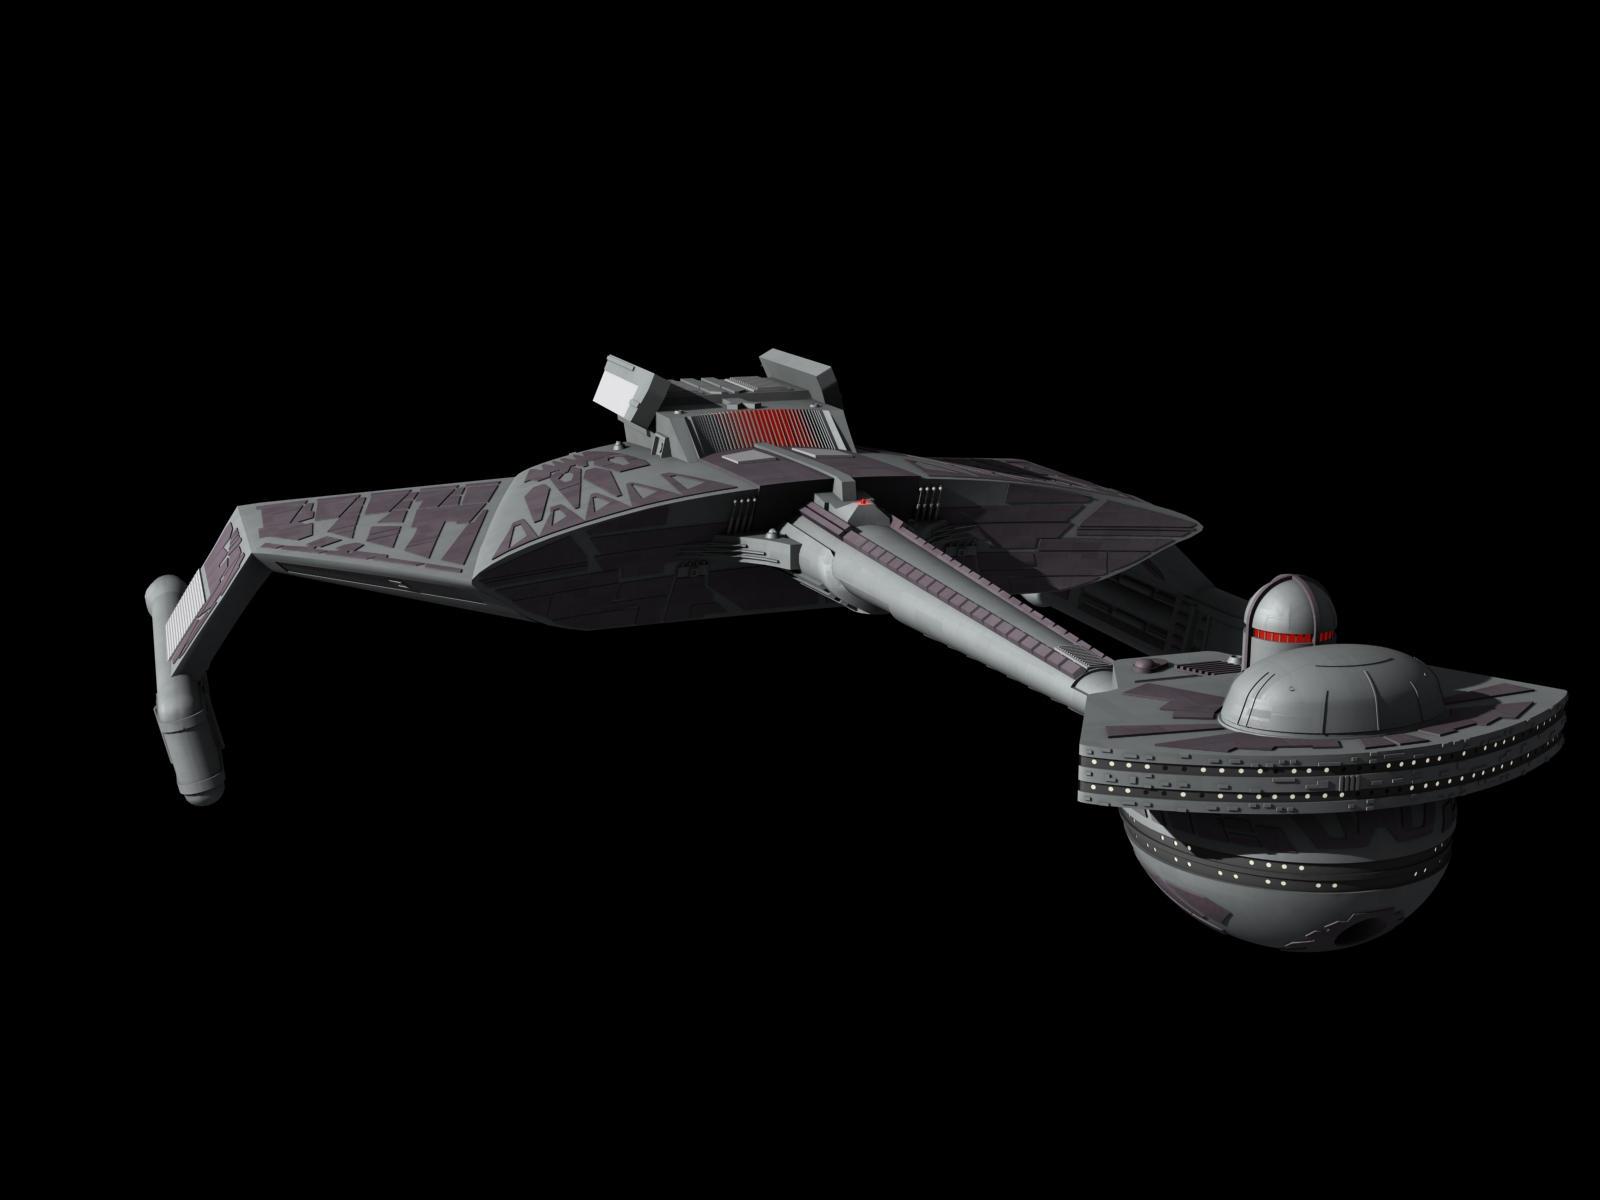 Klingon K't'inga class cruiser by metlesitsfleetyards